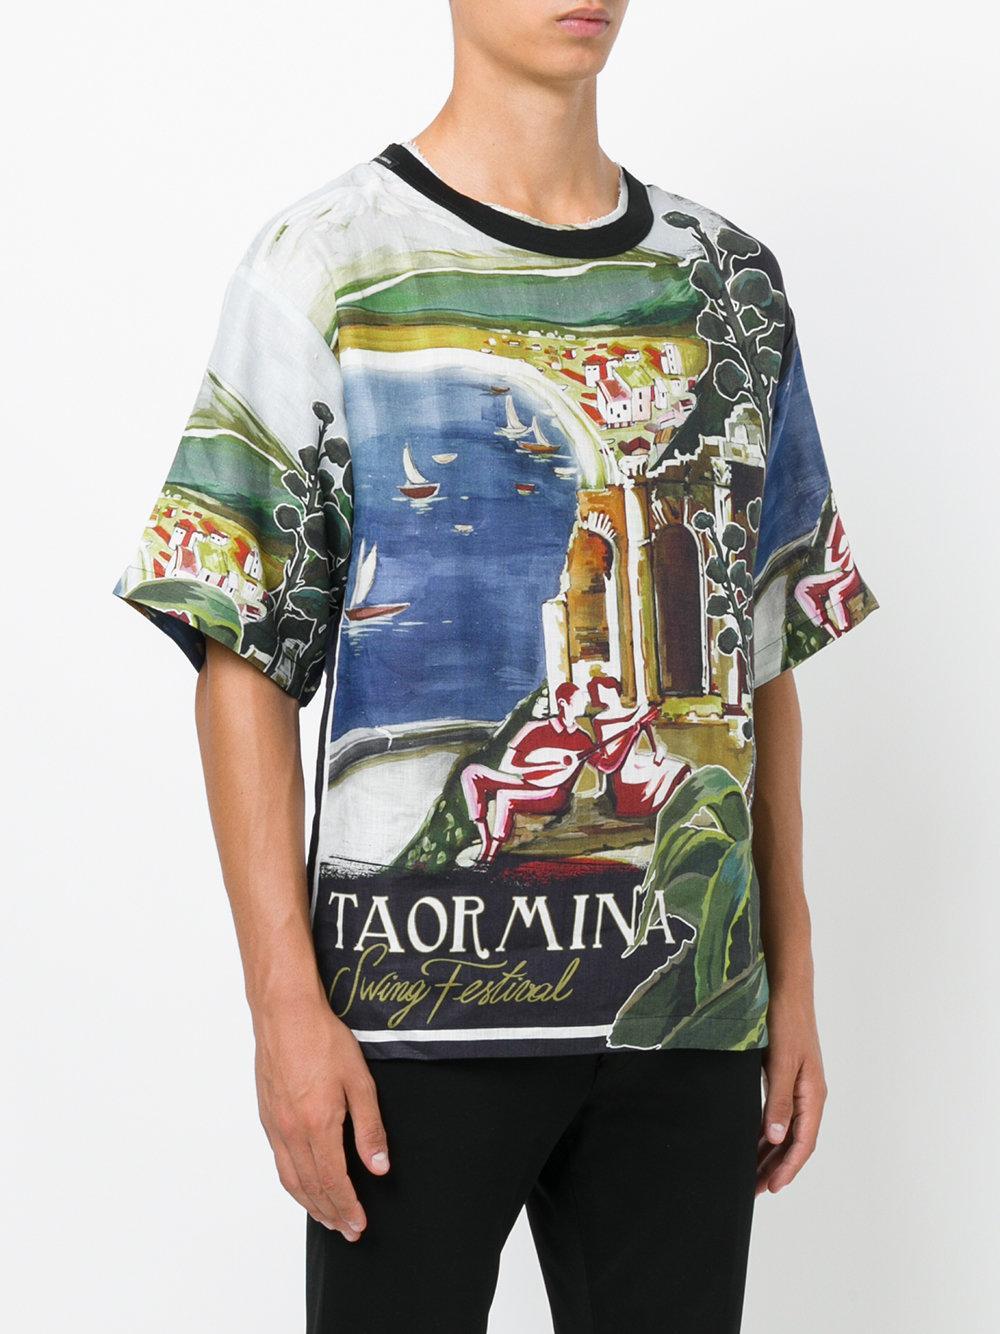 Dolce gabbana taormina printed t shirt in blue for men for Dolce and gabbana printed t shirts